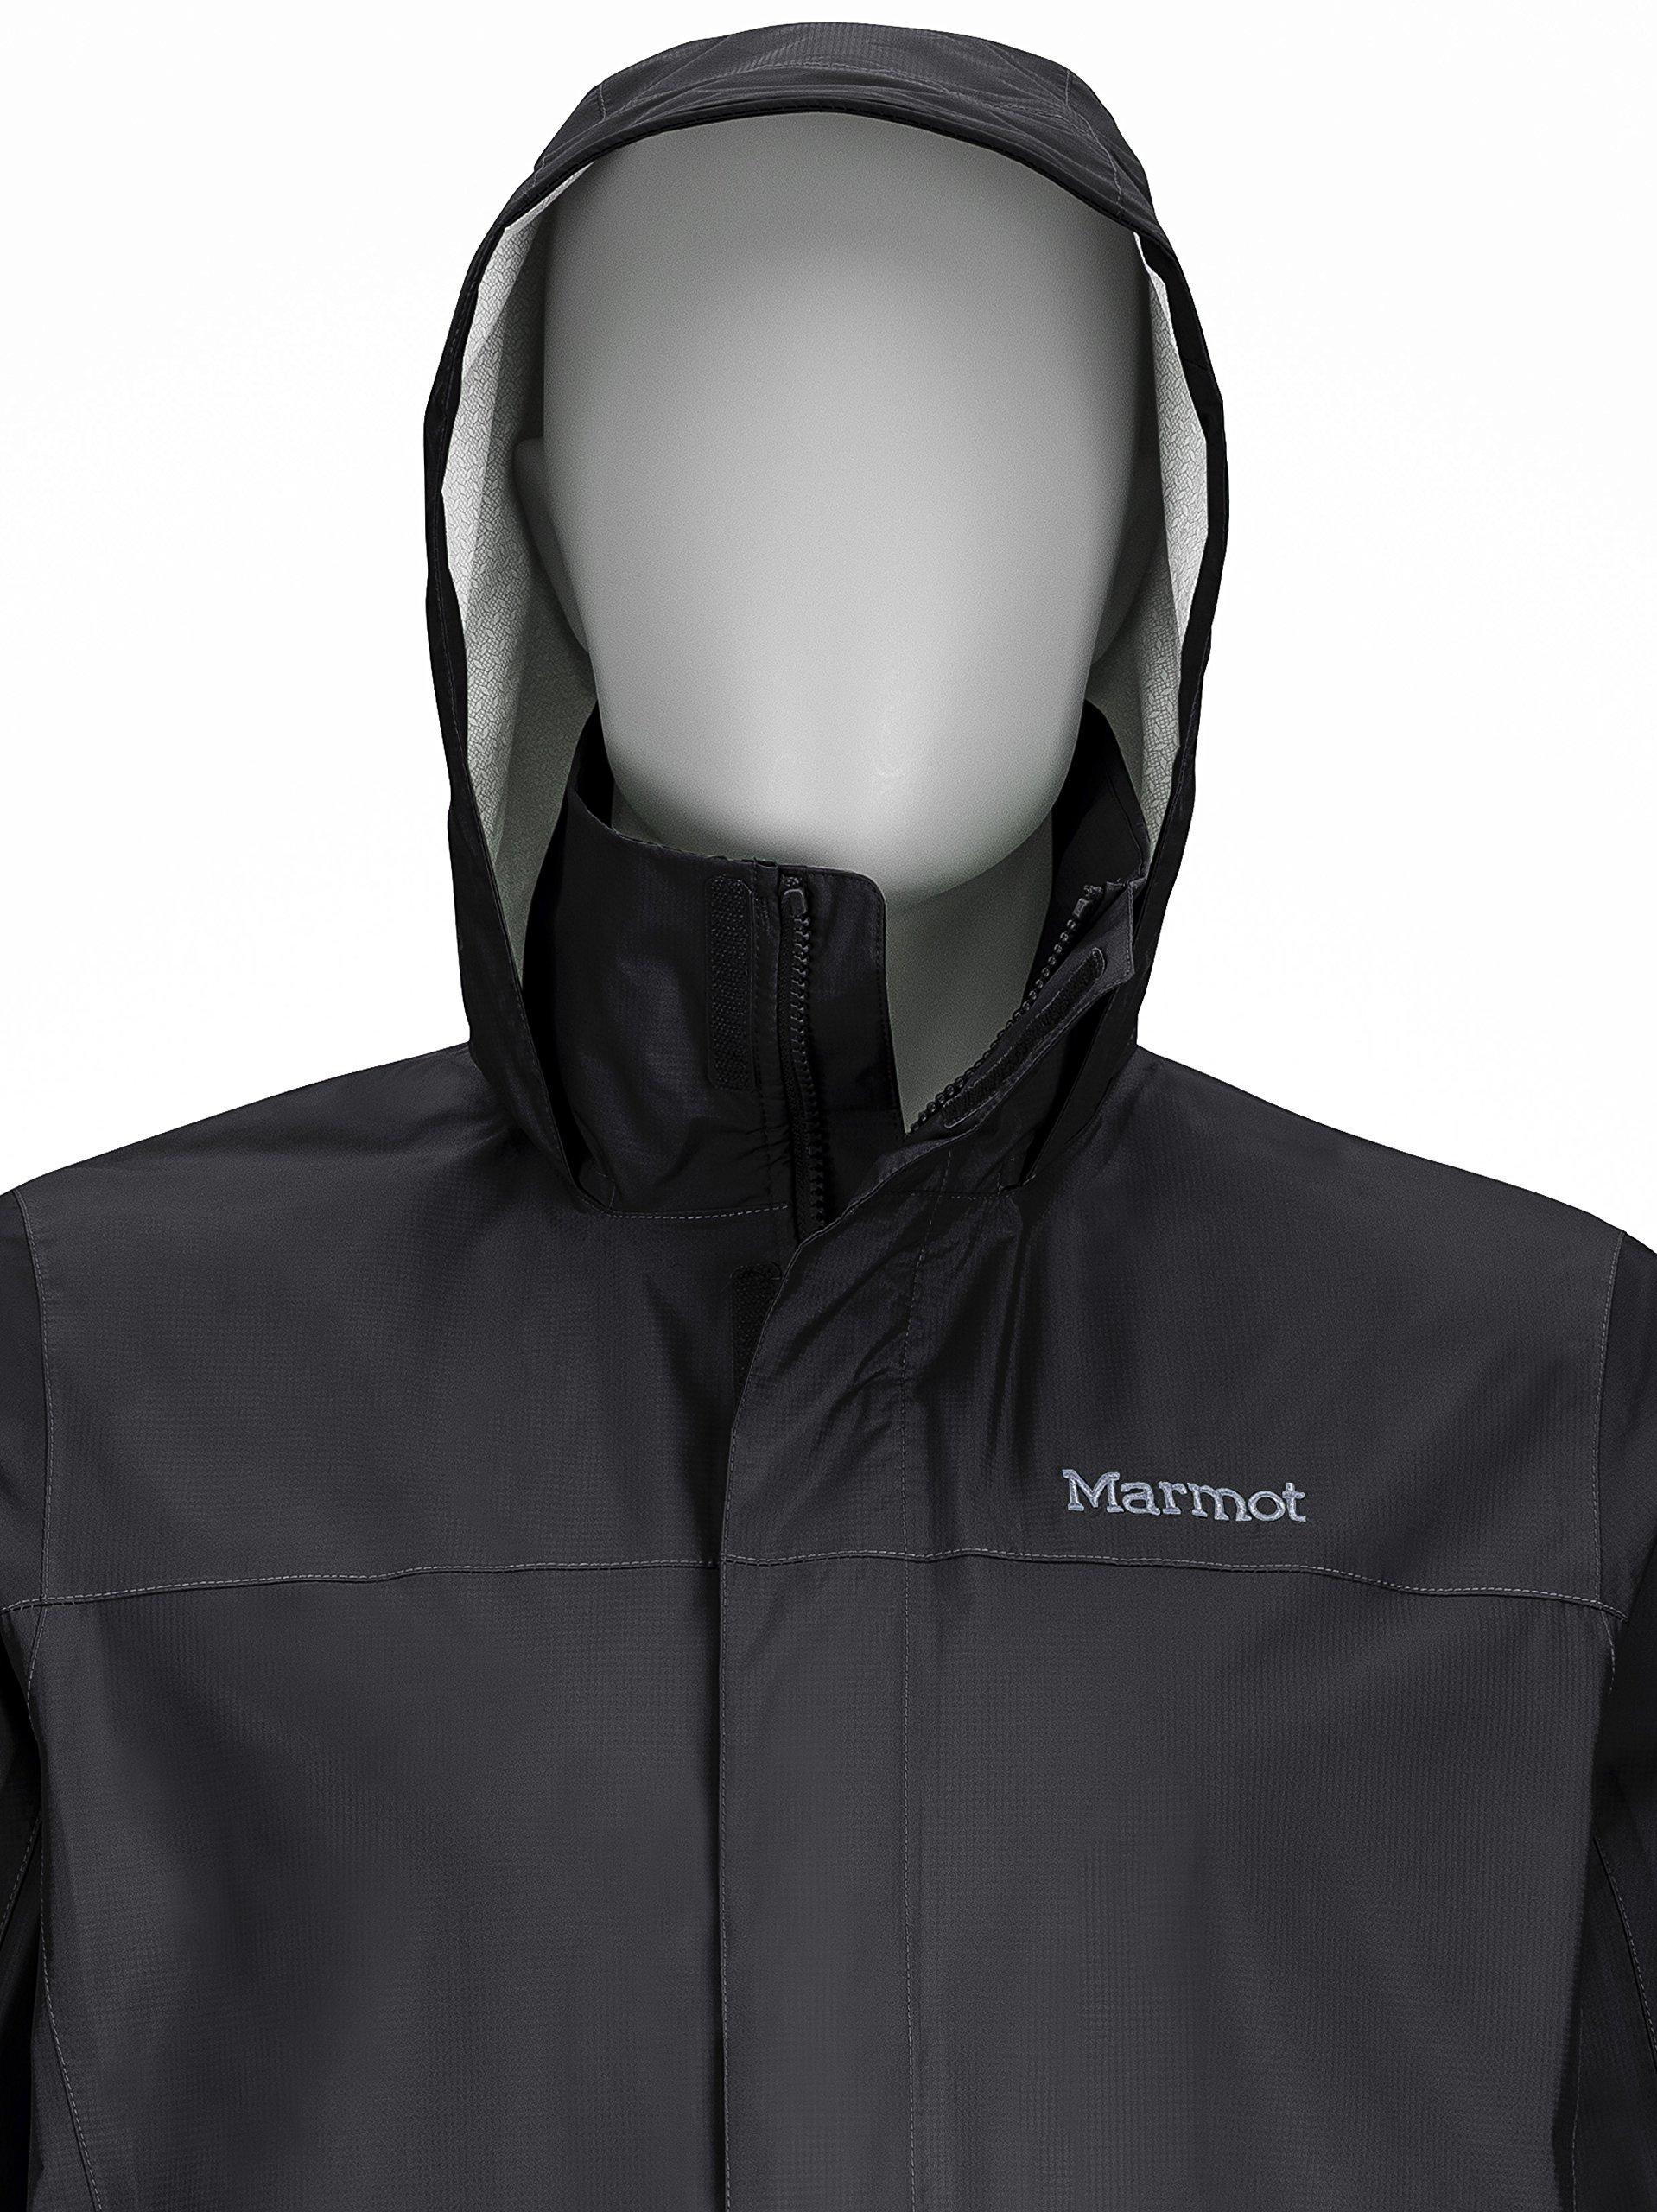 91AV%2BOkrpLL - Marmot PreCip Lightweight Raincoat, Men, Waterproof, Windproof & Breathable